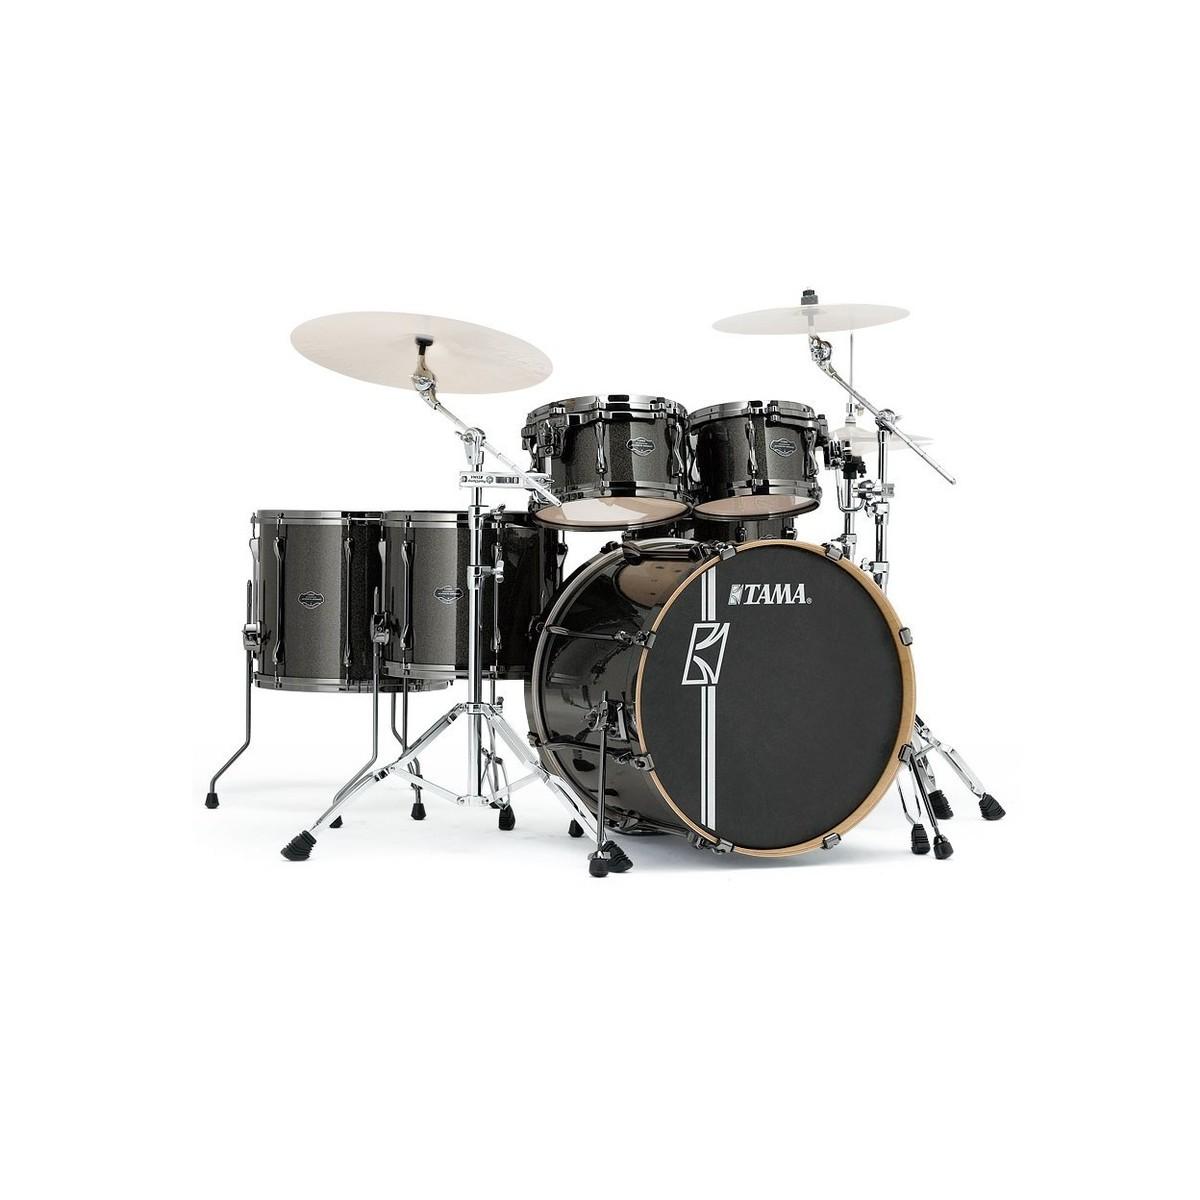 Tama Superstar Hyper-Drive 22'' 5pc Drum Kit, Midnight Gold Sparkle